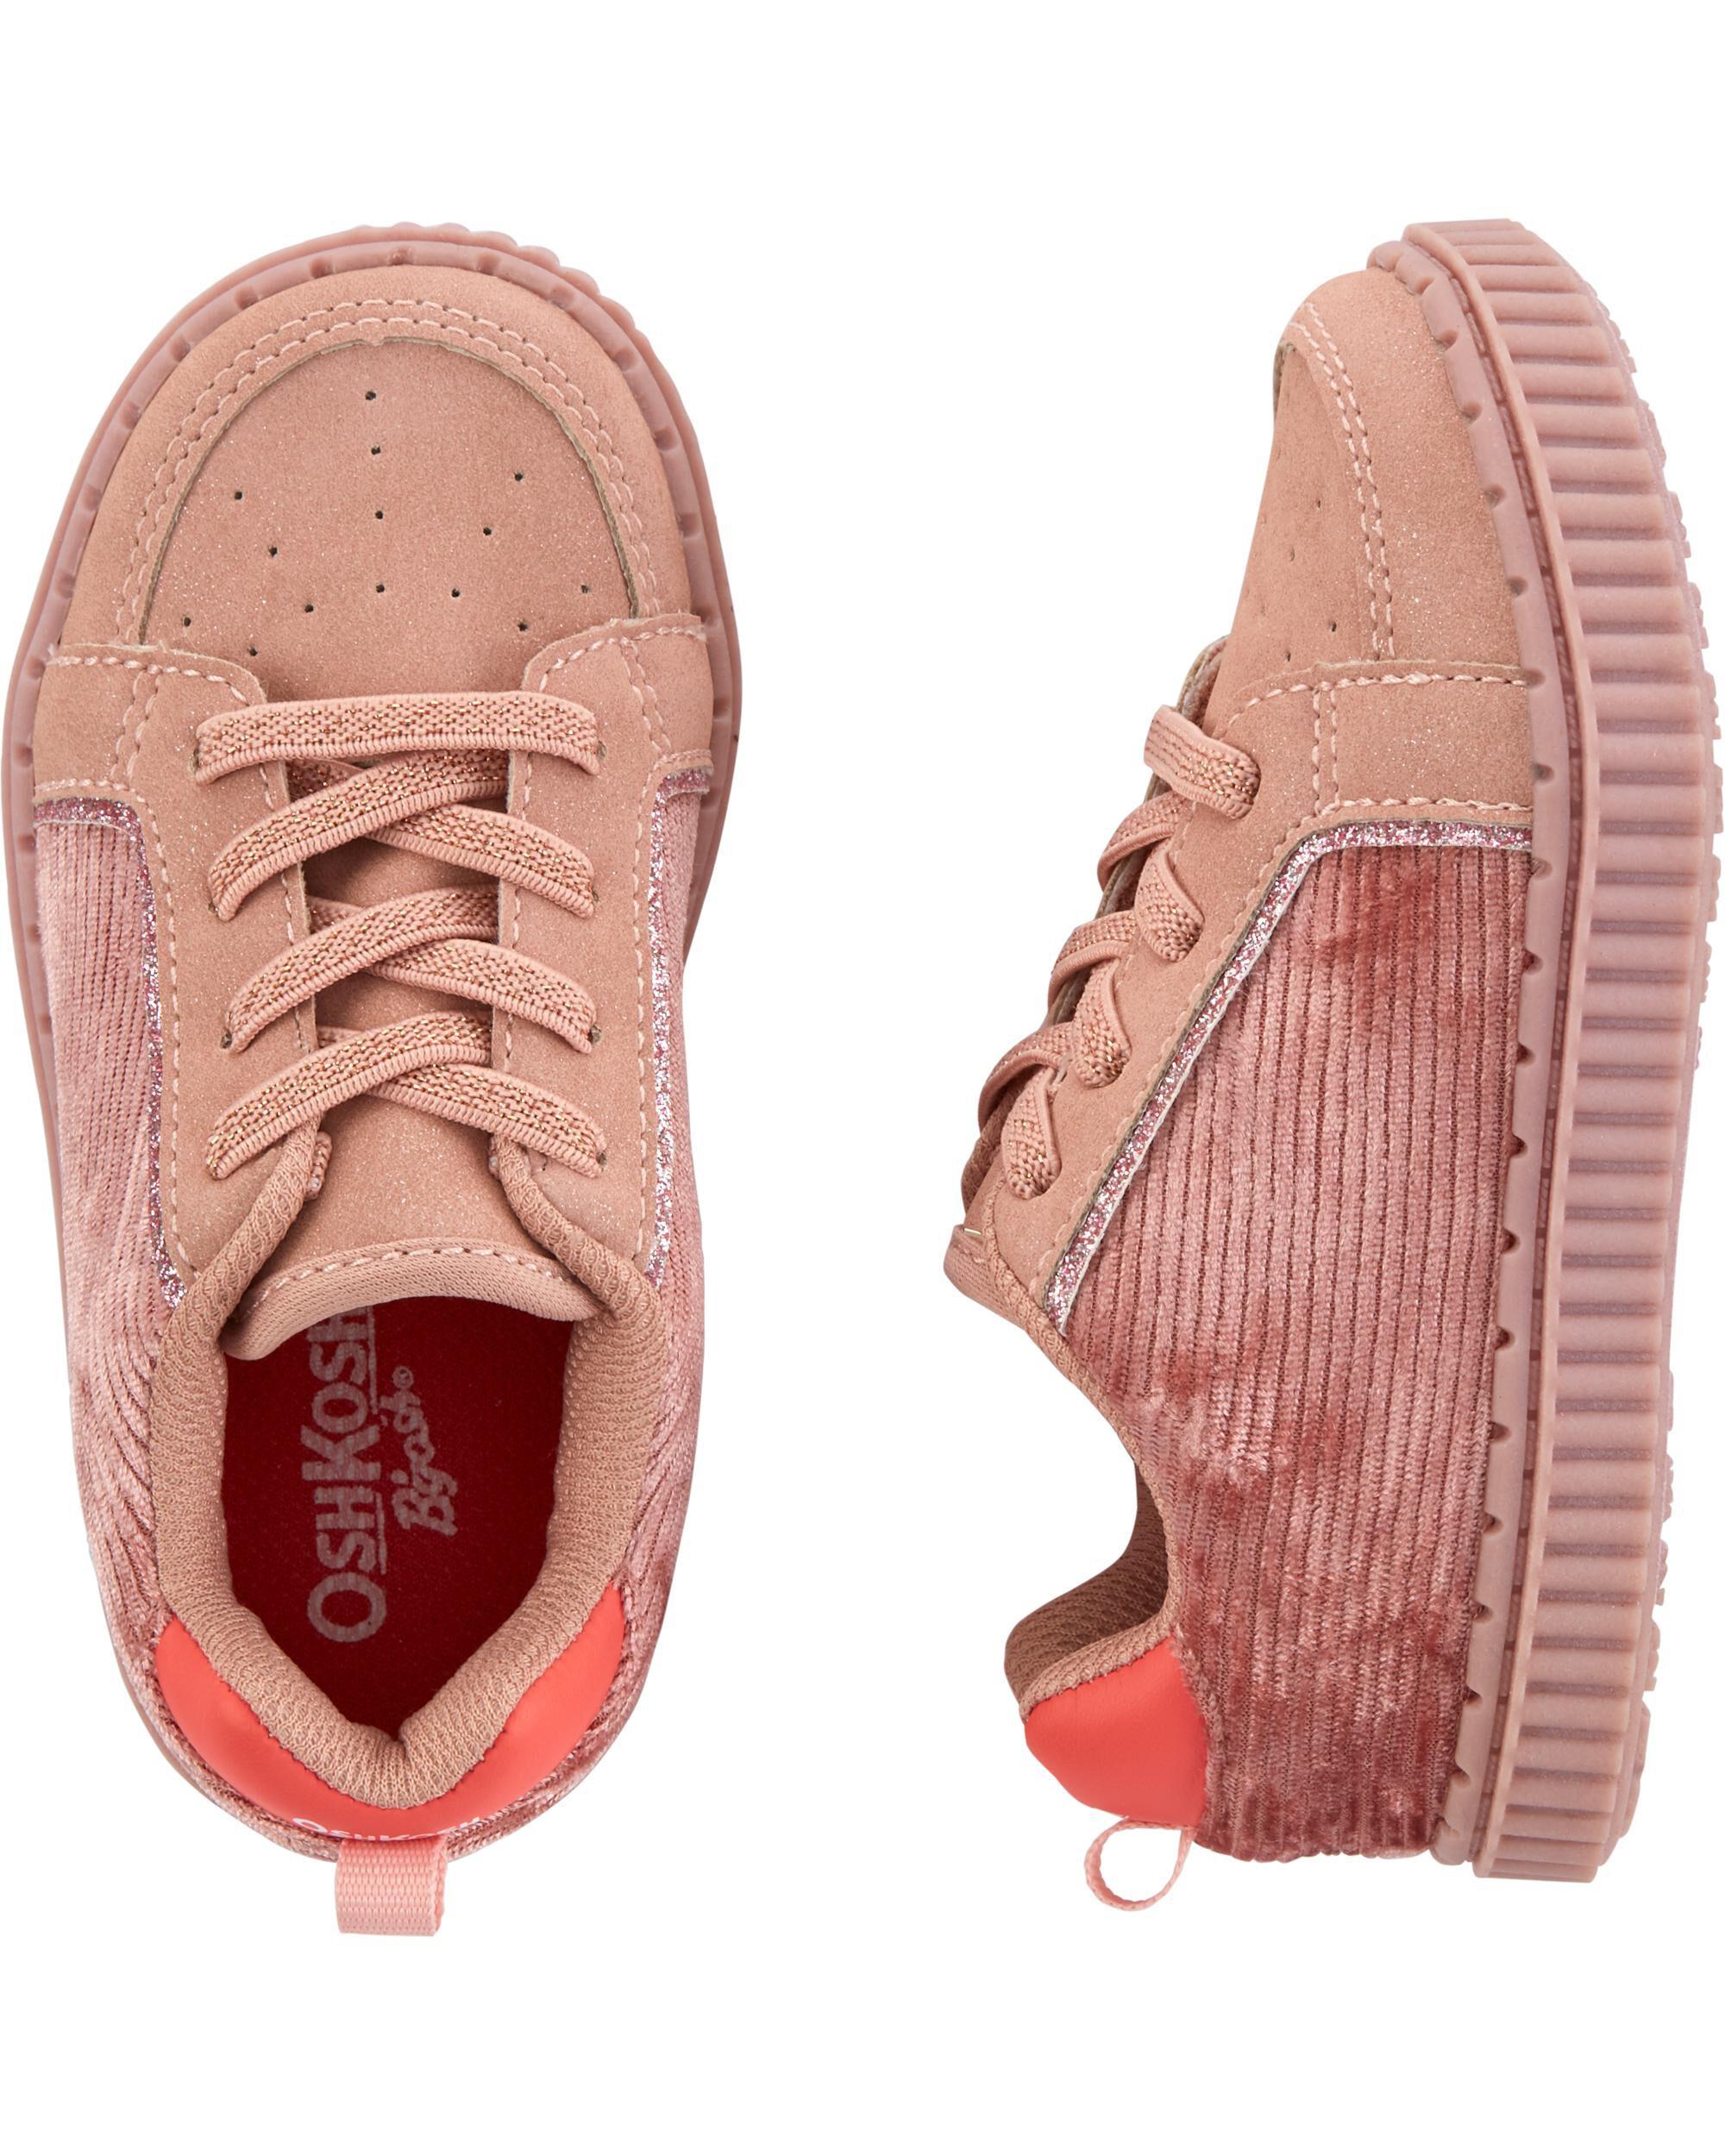 Oshkoshbgosh Pink Corduroy Sneakers